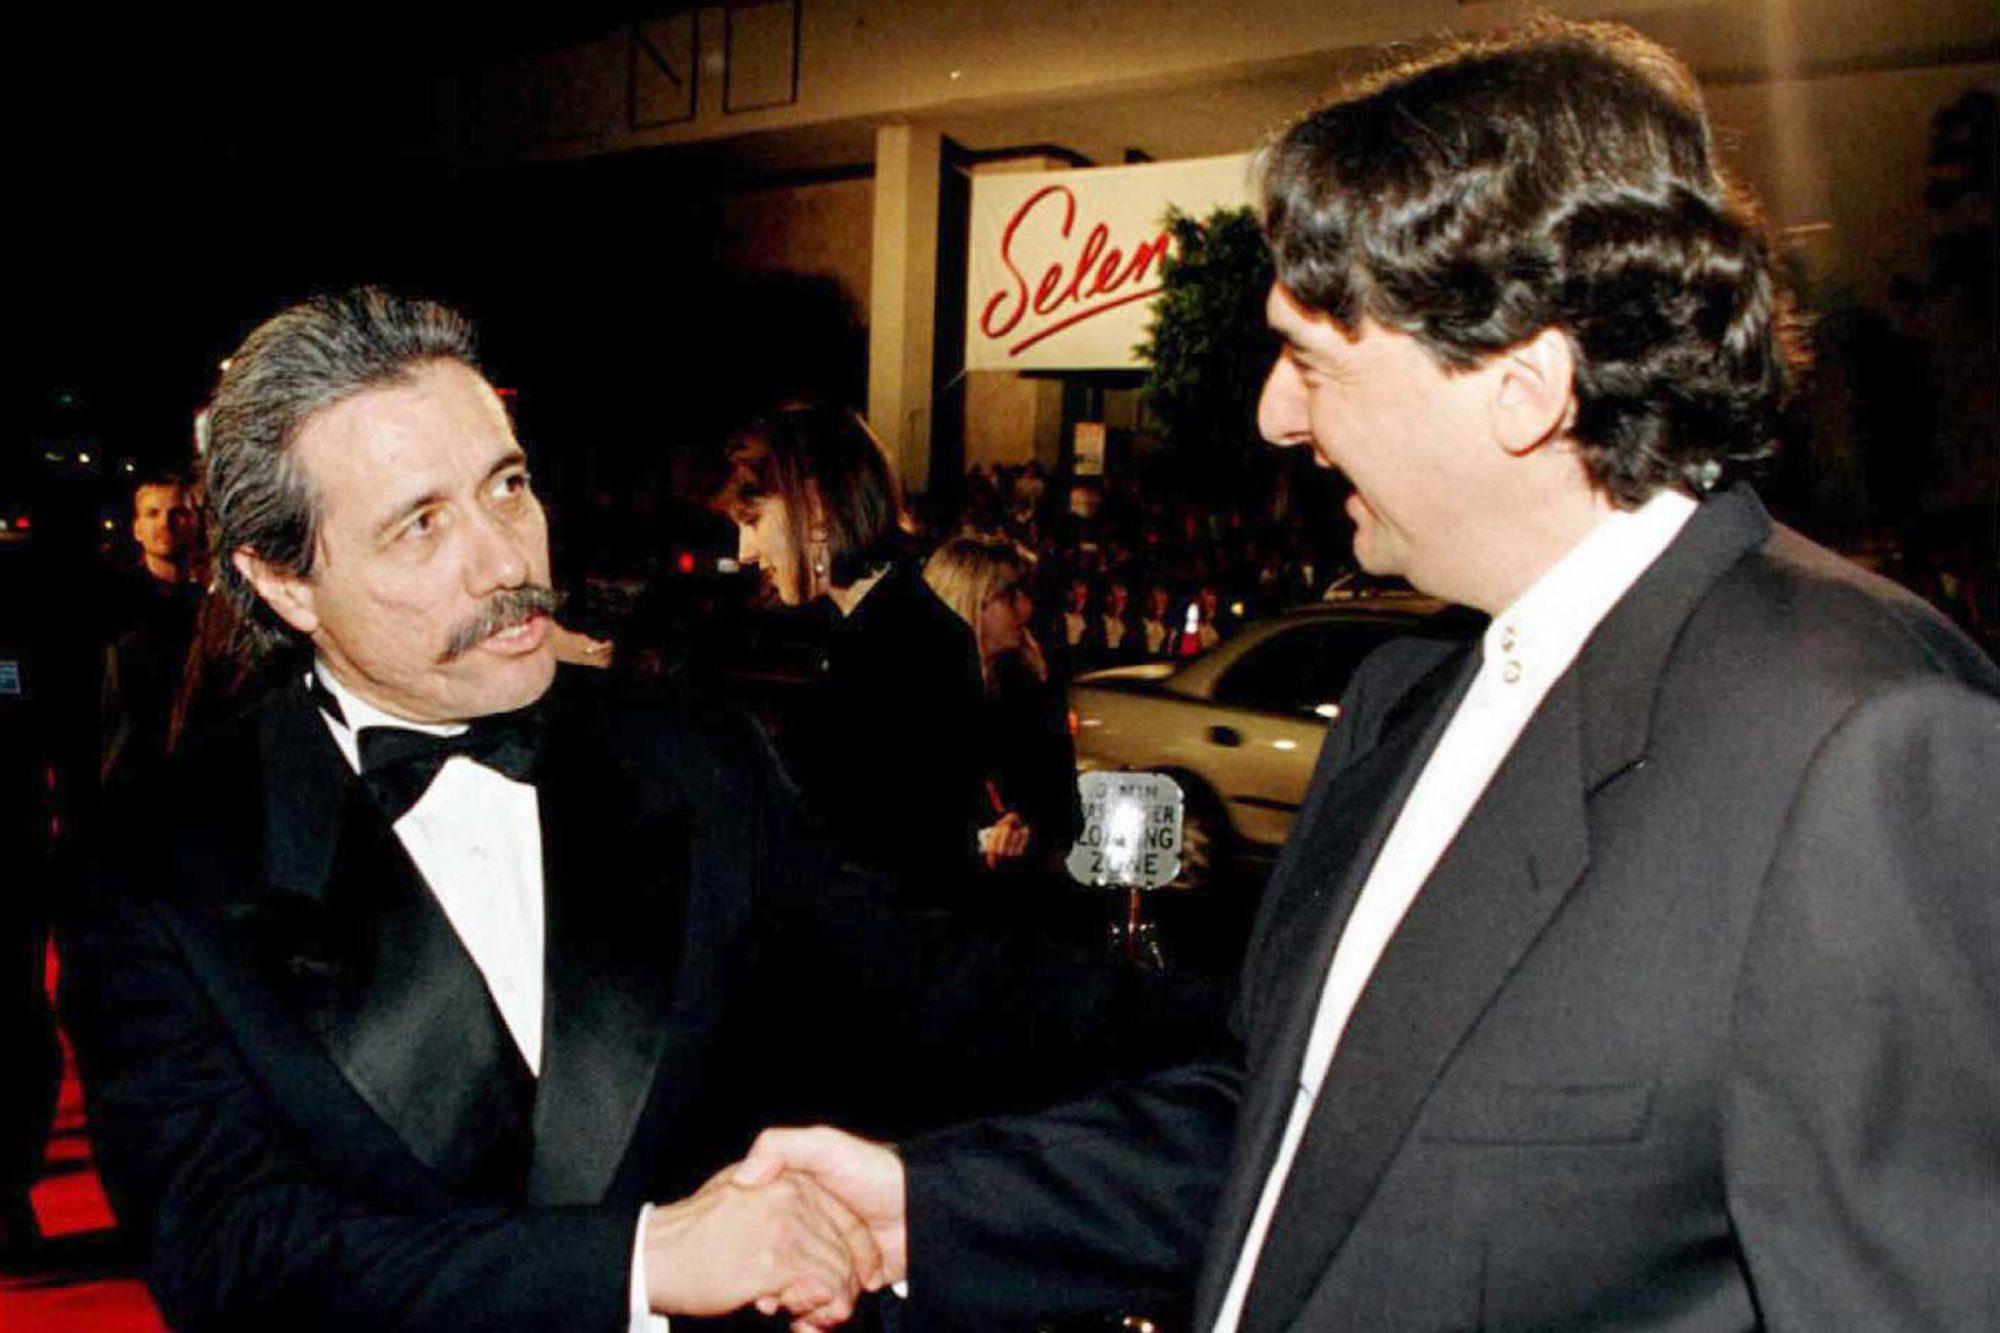 Actor Edward James Olmos (L) greets director Grego